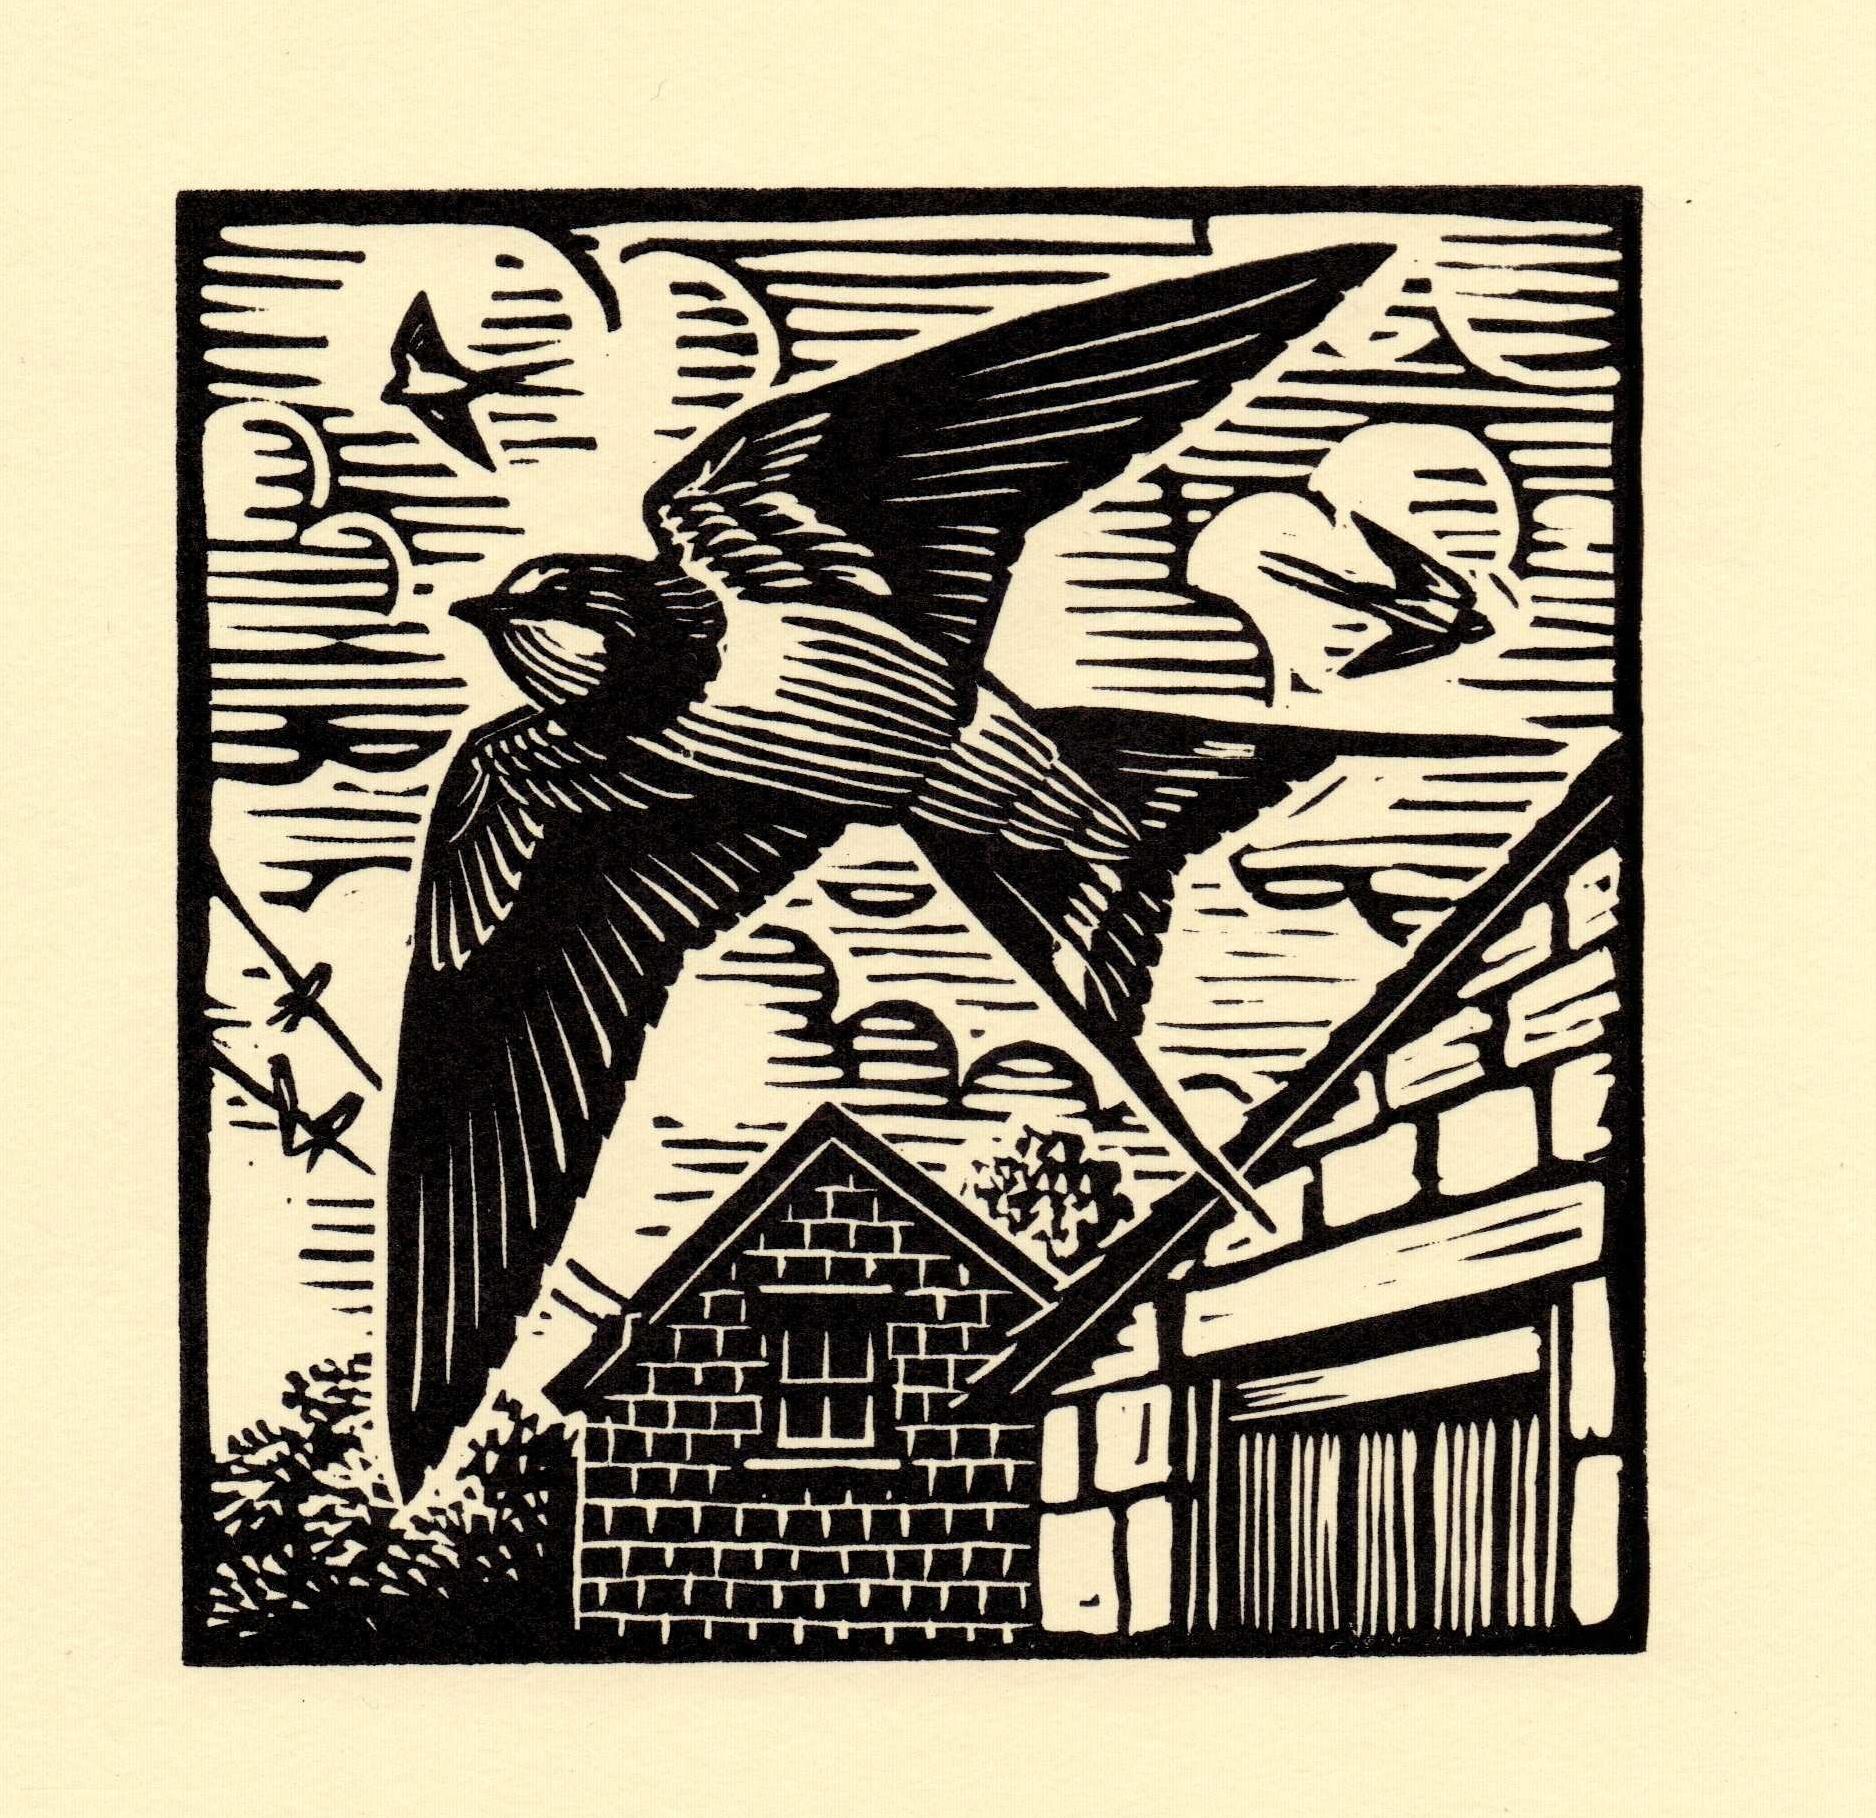 <p>Swallows by Richard Allen</p>